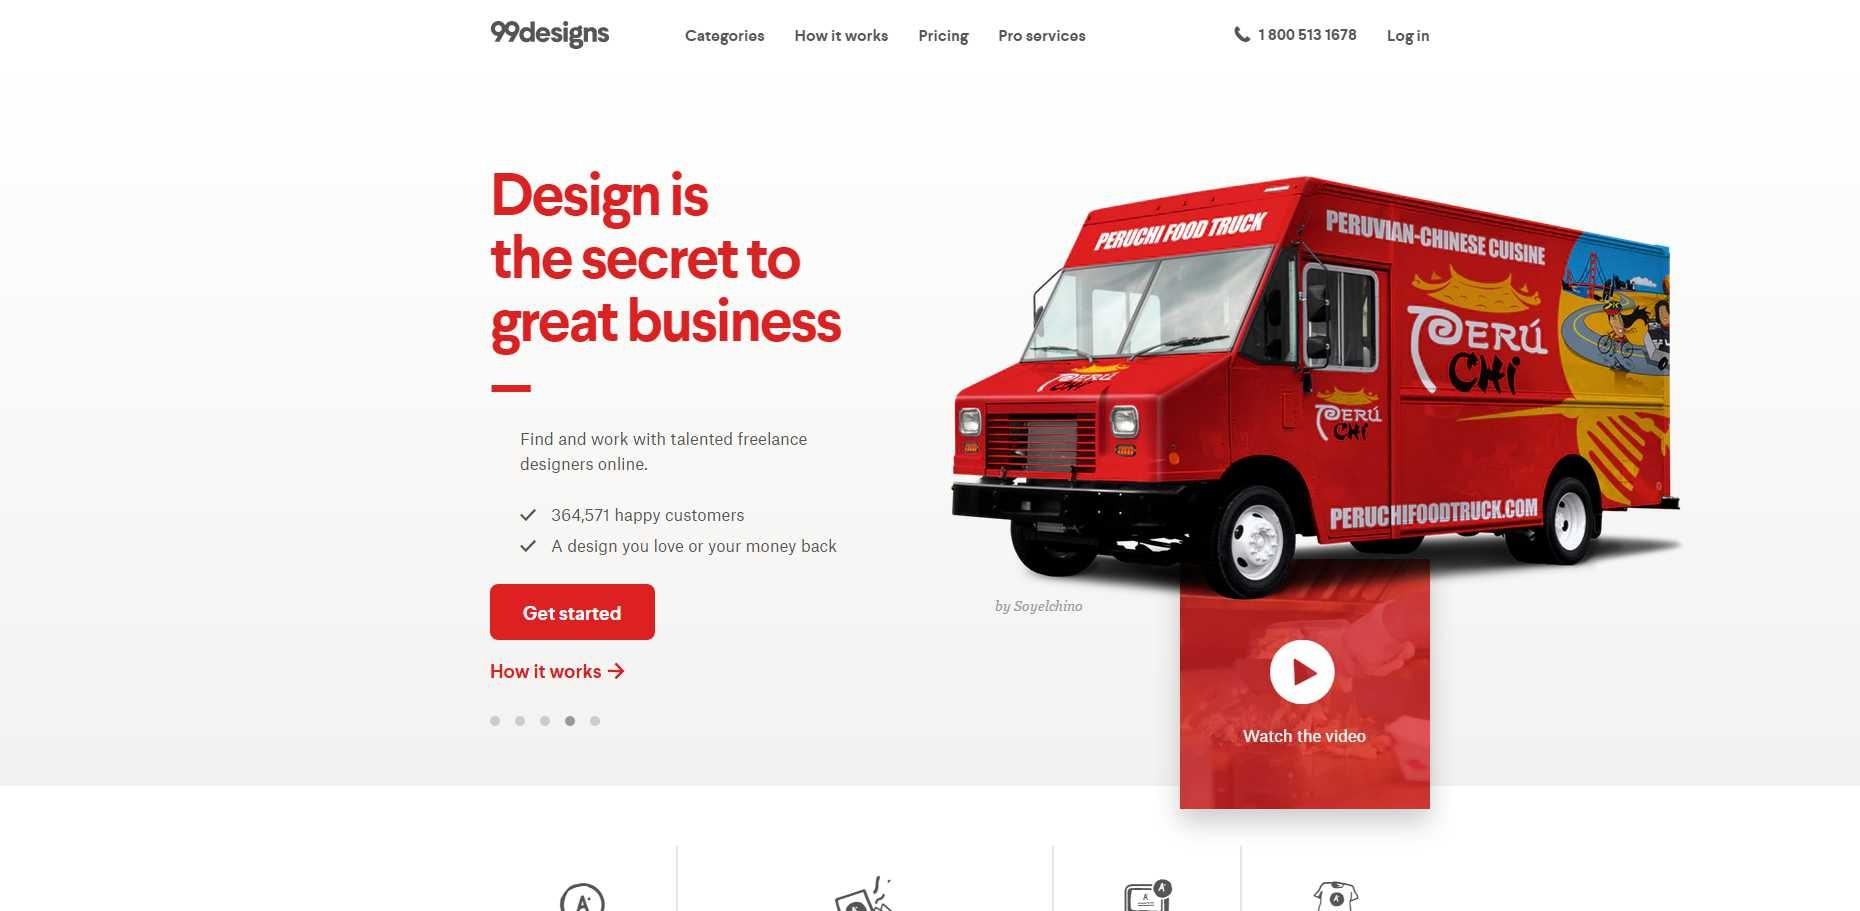 99designs homepage